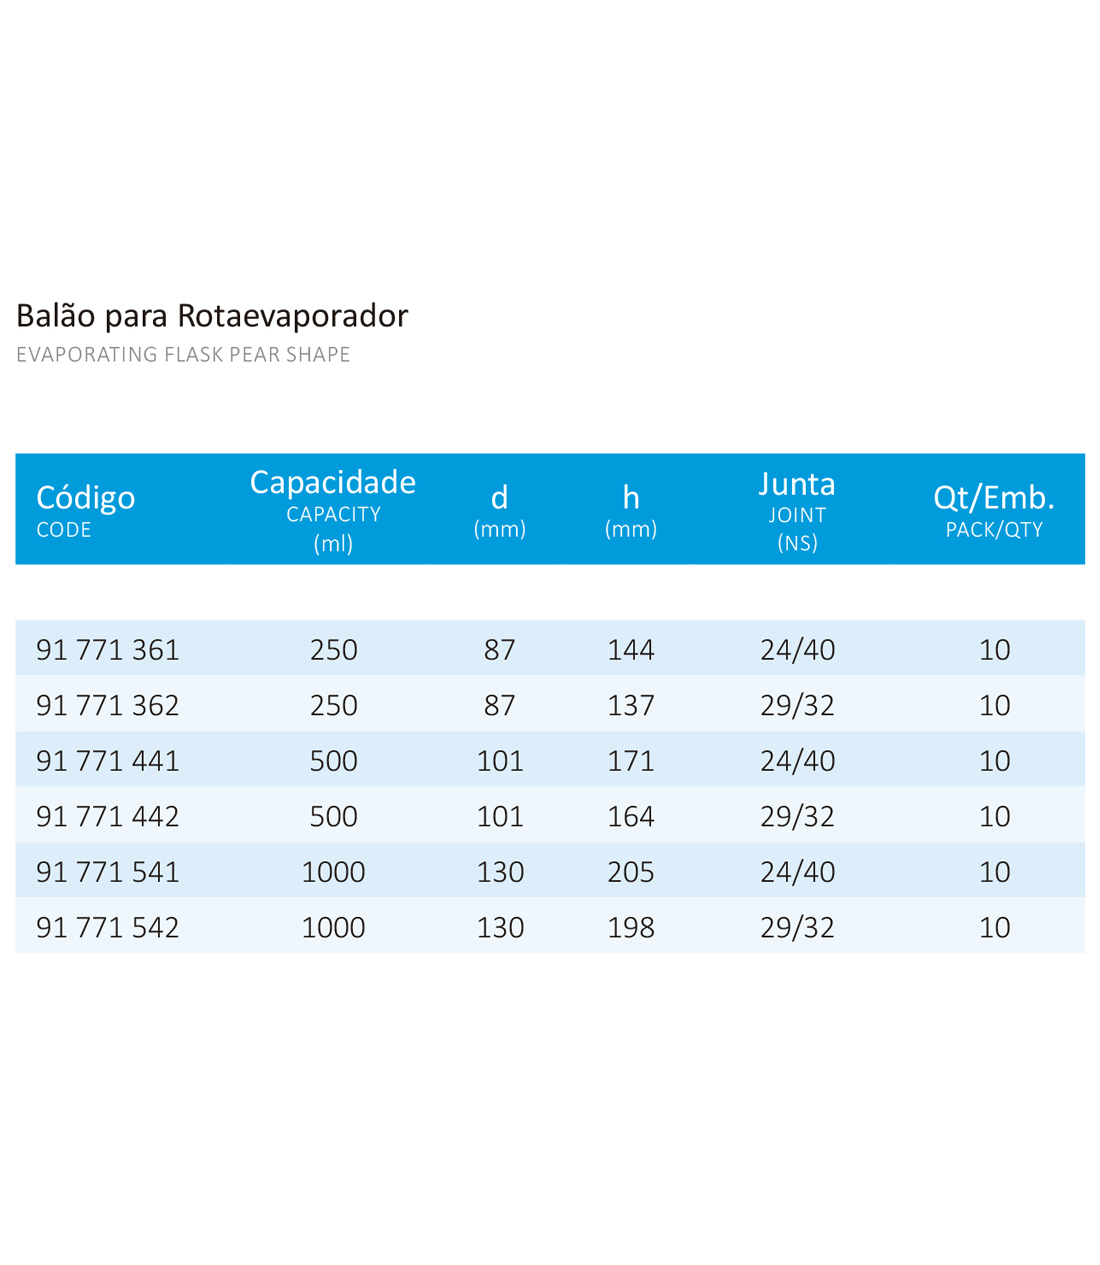 BALAO PARA ROTAEVAPORACAO COM JUNTA 29/32 1000 ML - Laborglas - Cód. 91771542